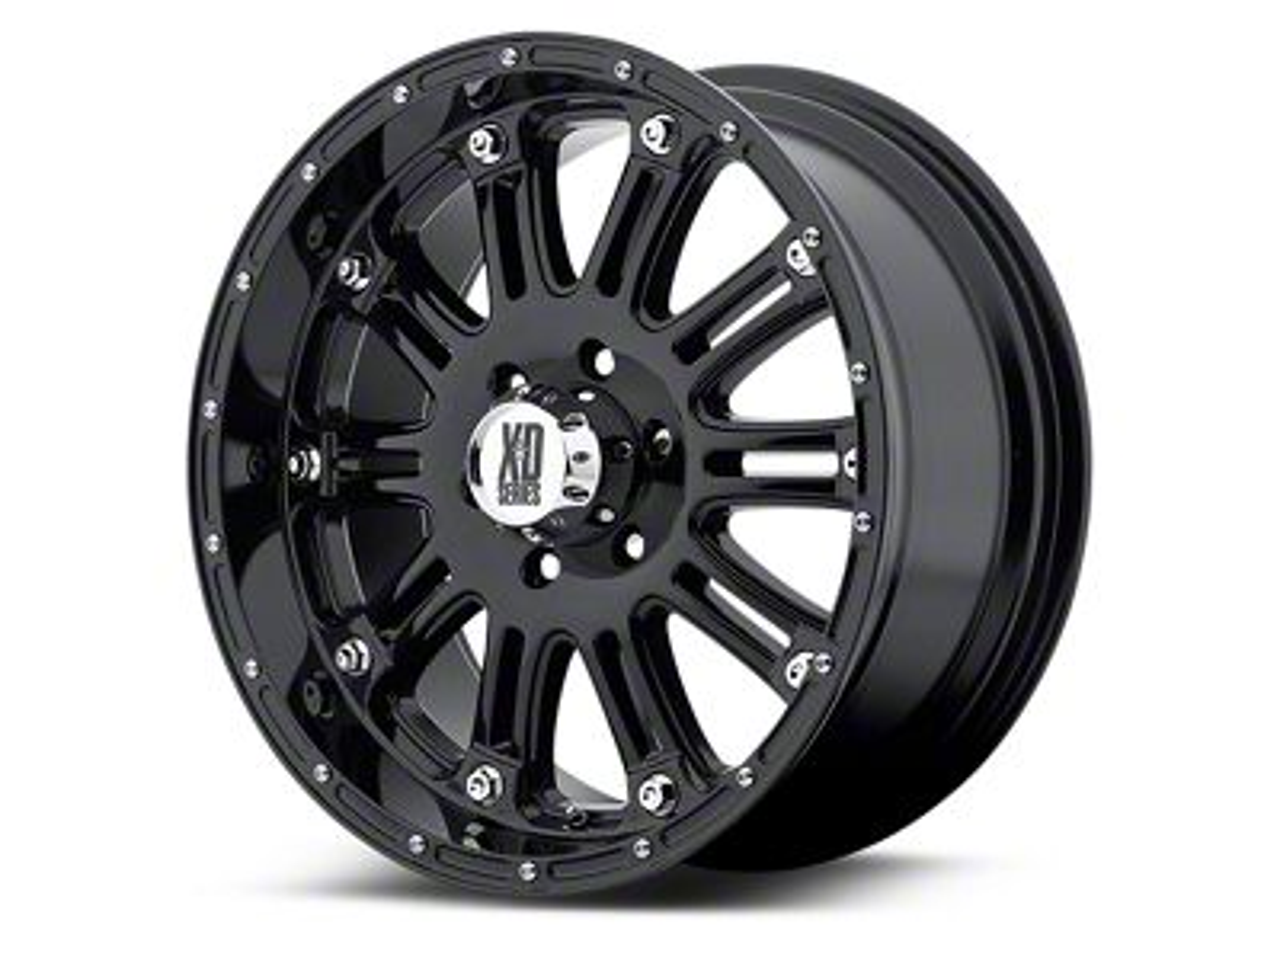 XD Hoss Gloss Black 5-Lug Wheel - 20x9 (02-18 RAM 1500, Excluding Mega Cab)